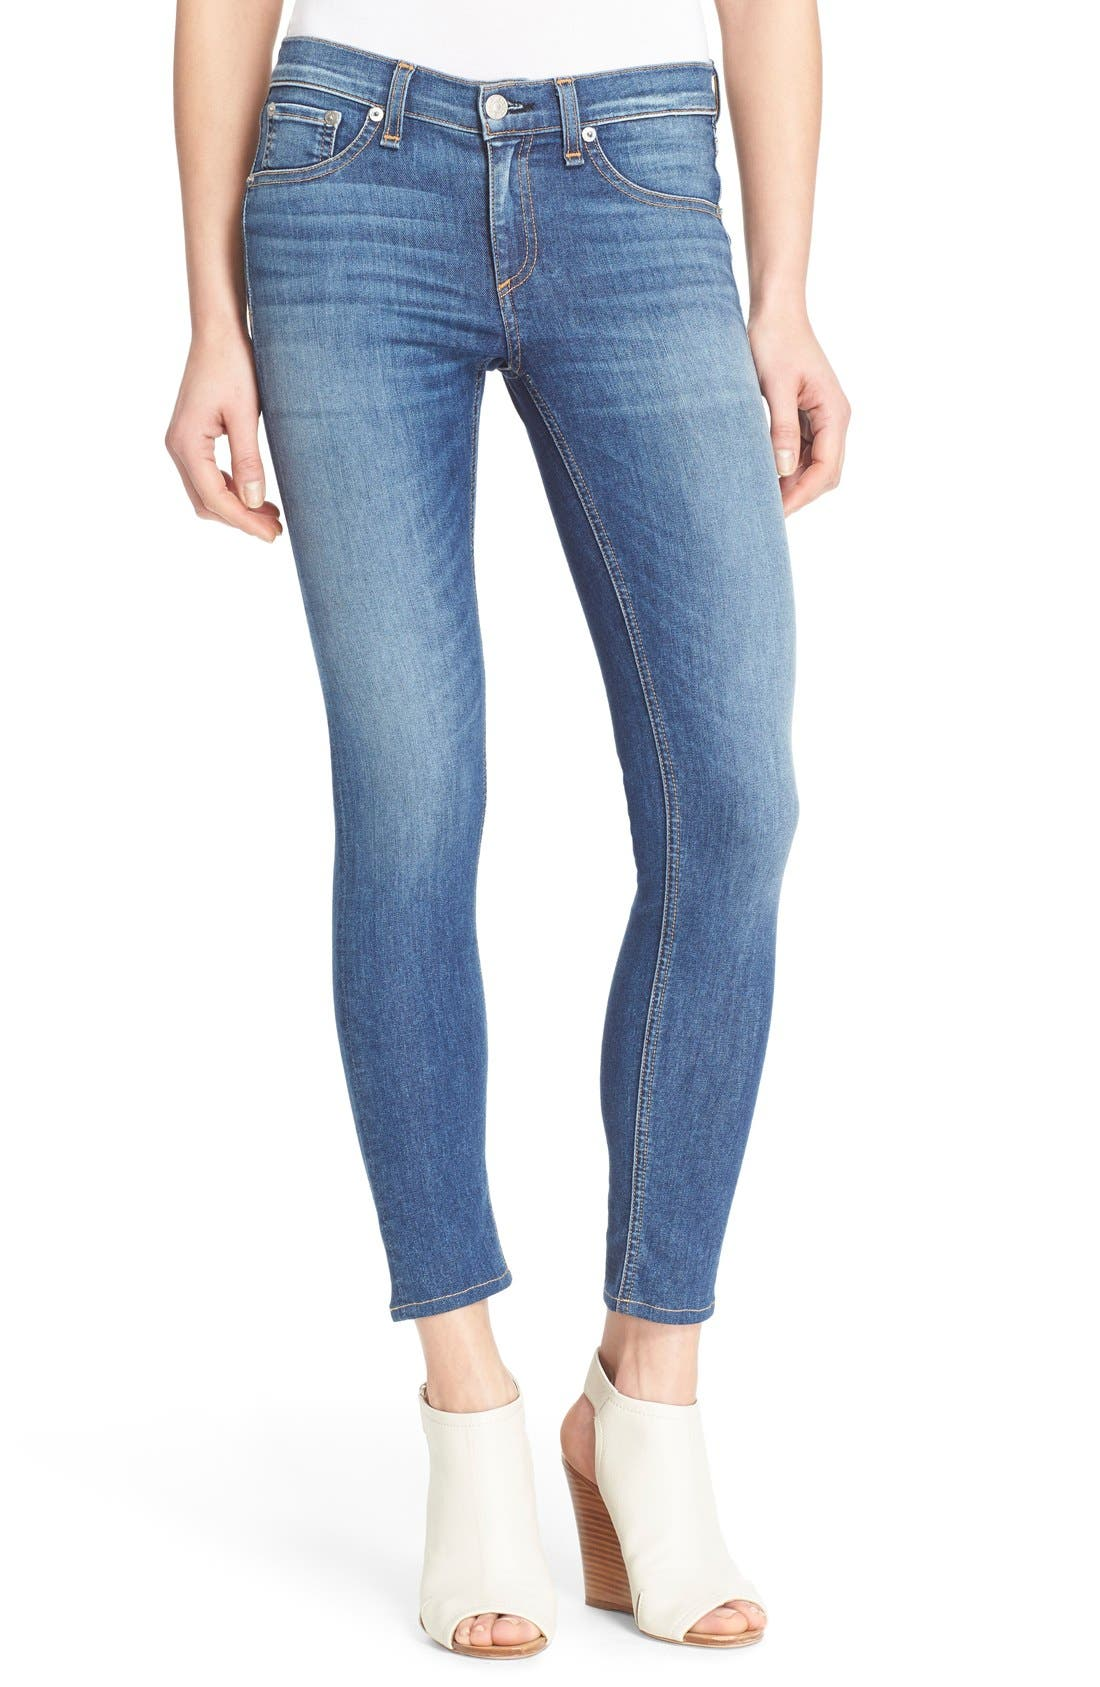 Rag & Bone/JEAN Low Rise Skinny Jeans for Women | Nordstrom